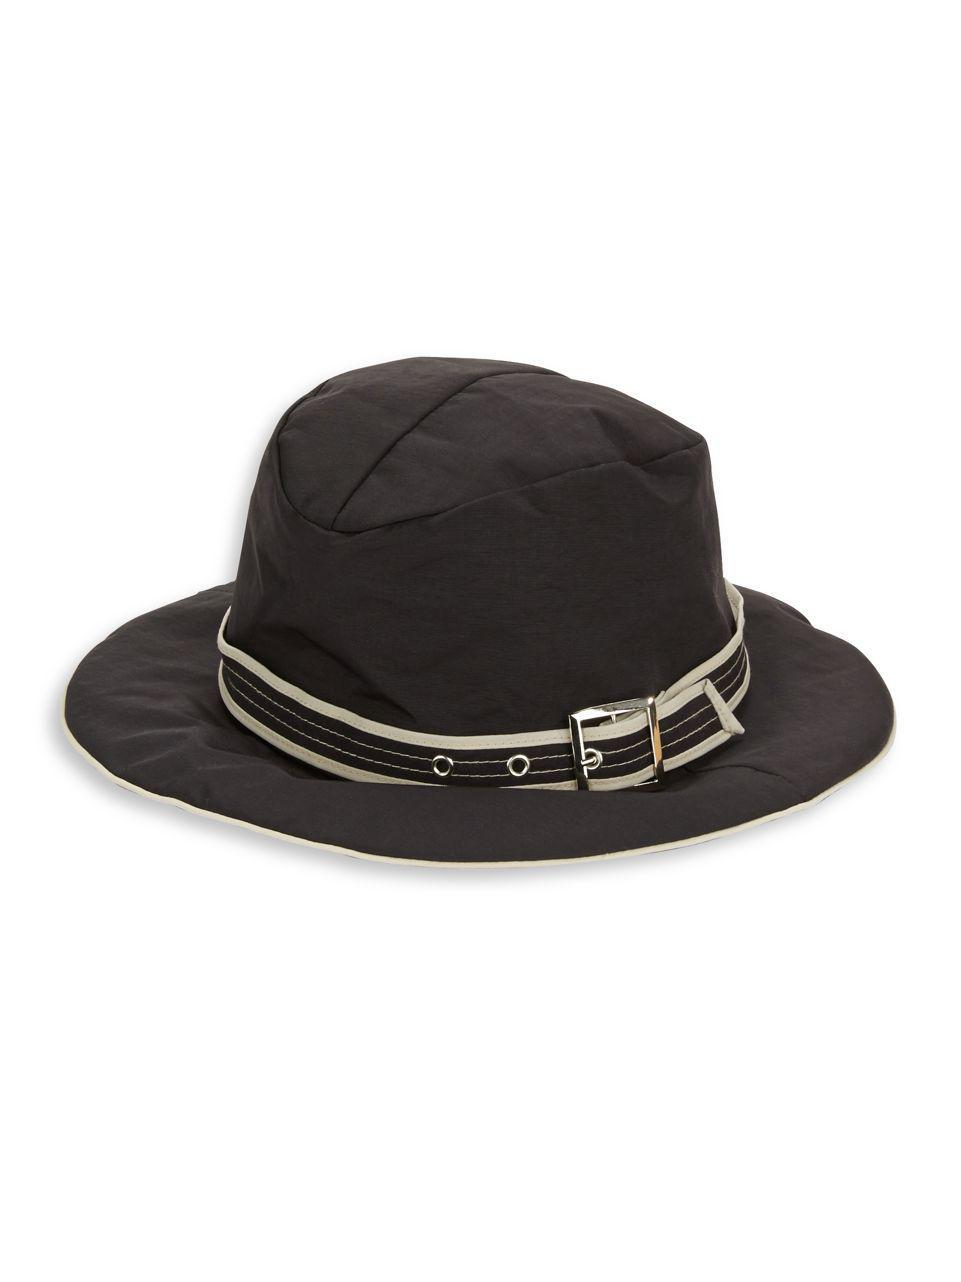 Lyst - Parkhurst Stella Bucket Hat in Black - Save 37.77777777777778% de0ae03f84b6